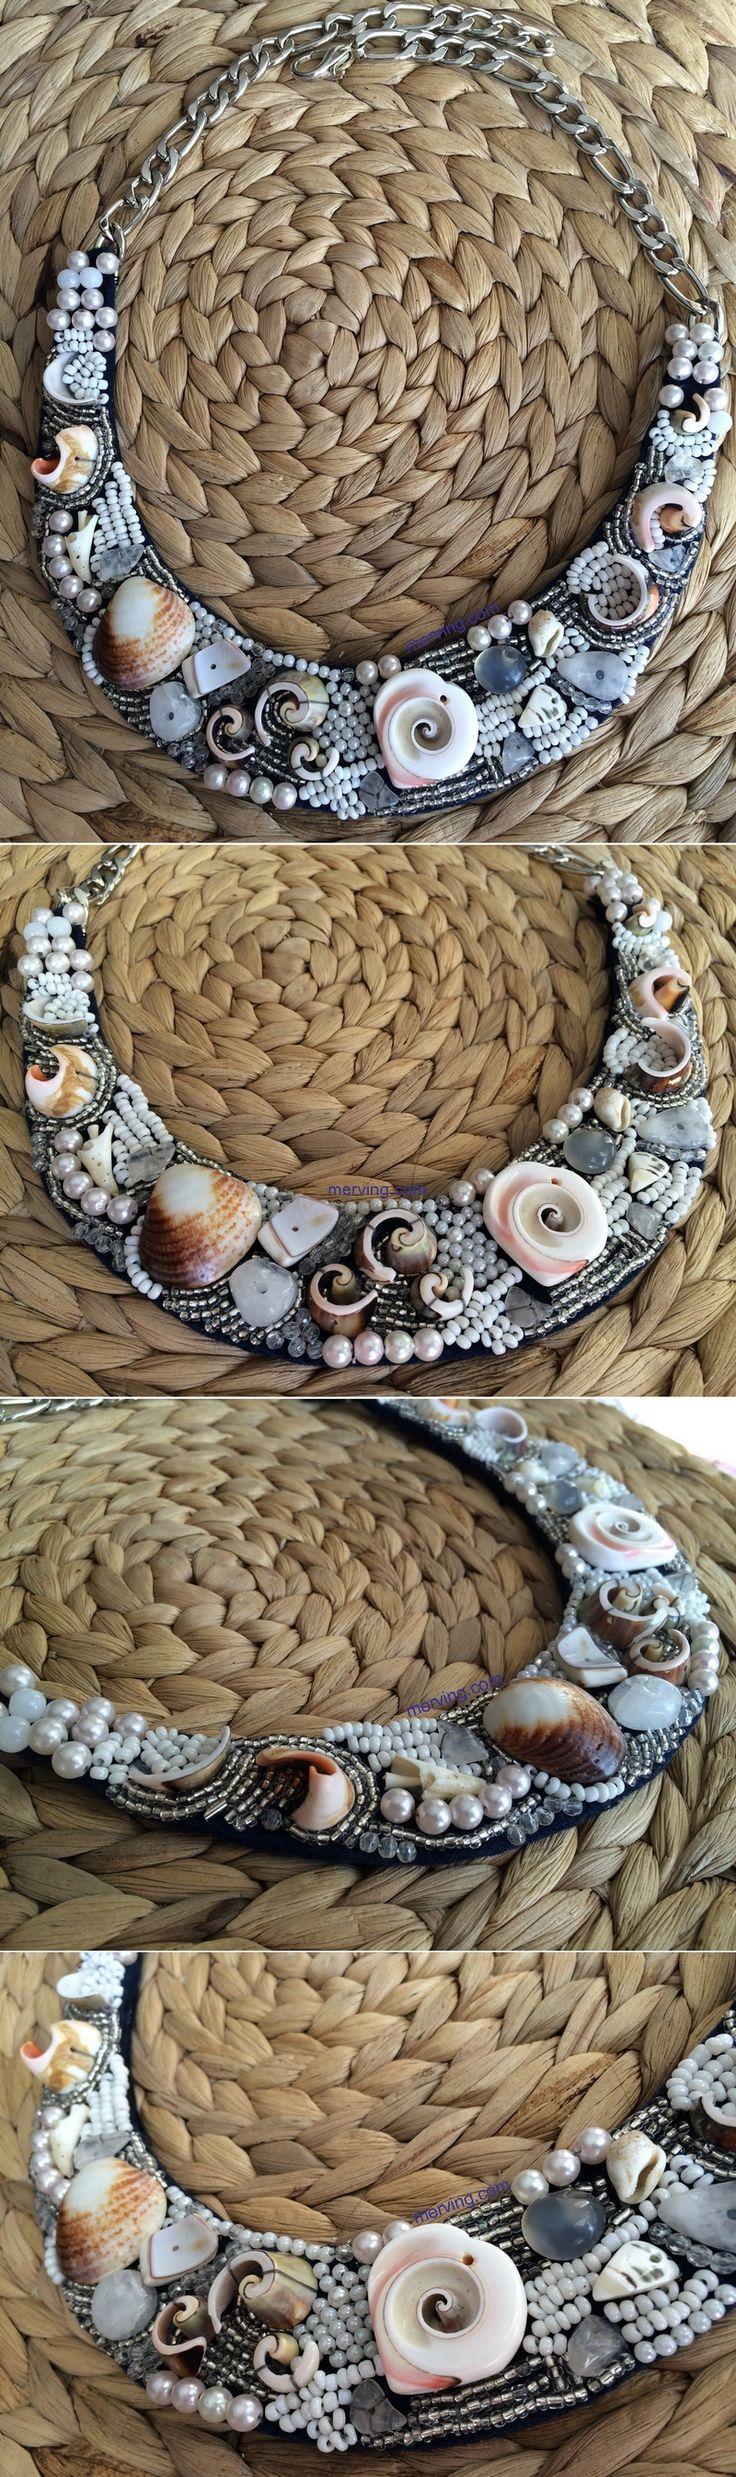 Merving Shop açılıyor... www.merving.com #necklace #kolye #taslikolye #bignecklace #shop #sale #mervingdesign #mervingcom #mervingshop #like #handmade #diynecklace #blog #blogger #elyapimi #handmade #fashion #fashionnecklace #fashion #whitenecklace #sea